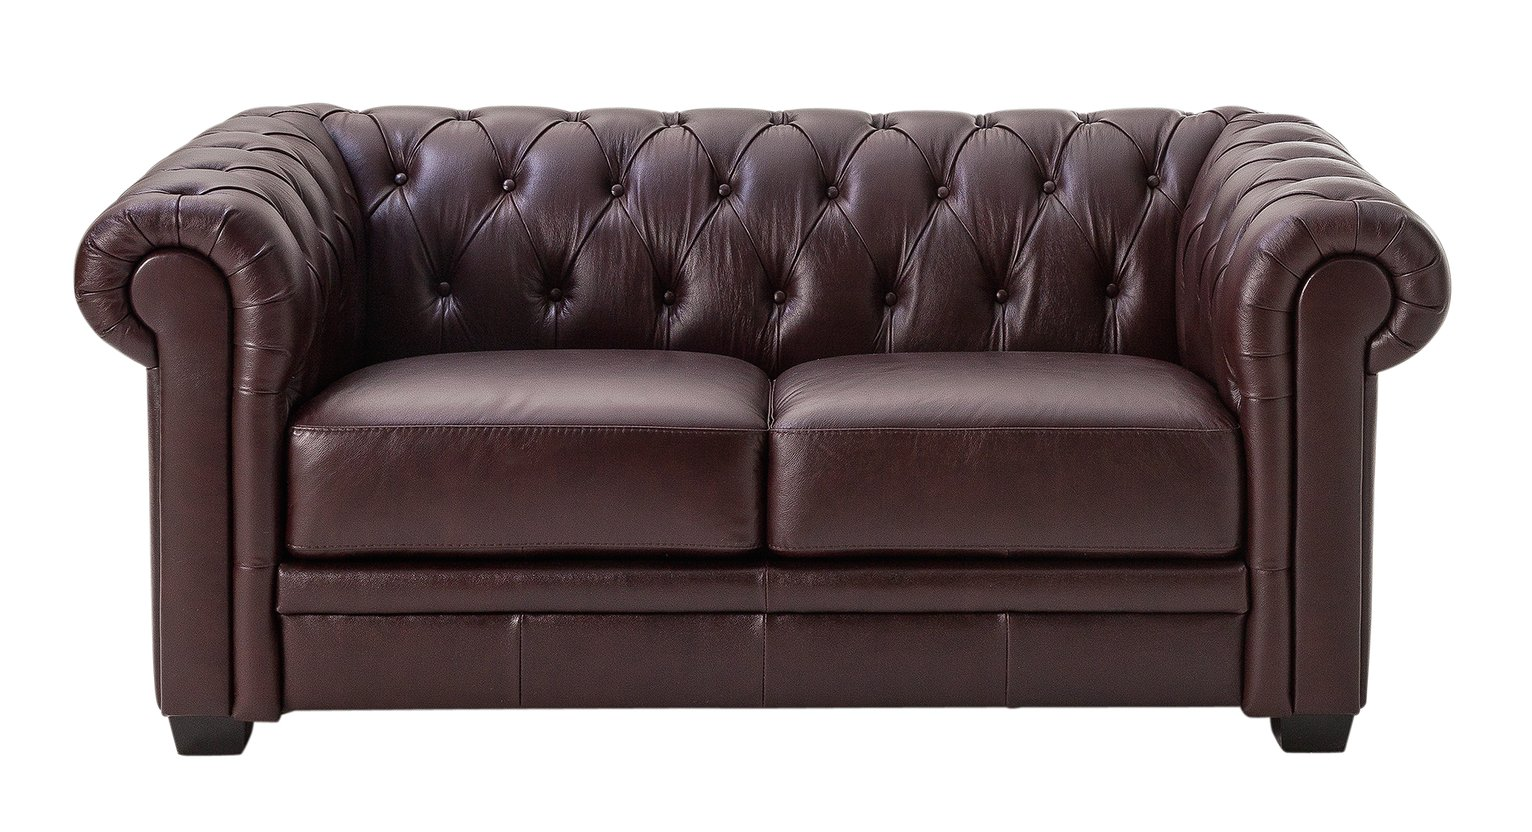 Habitat Chesterfield 2 Seater Leather Sofa - Walnut